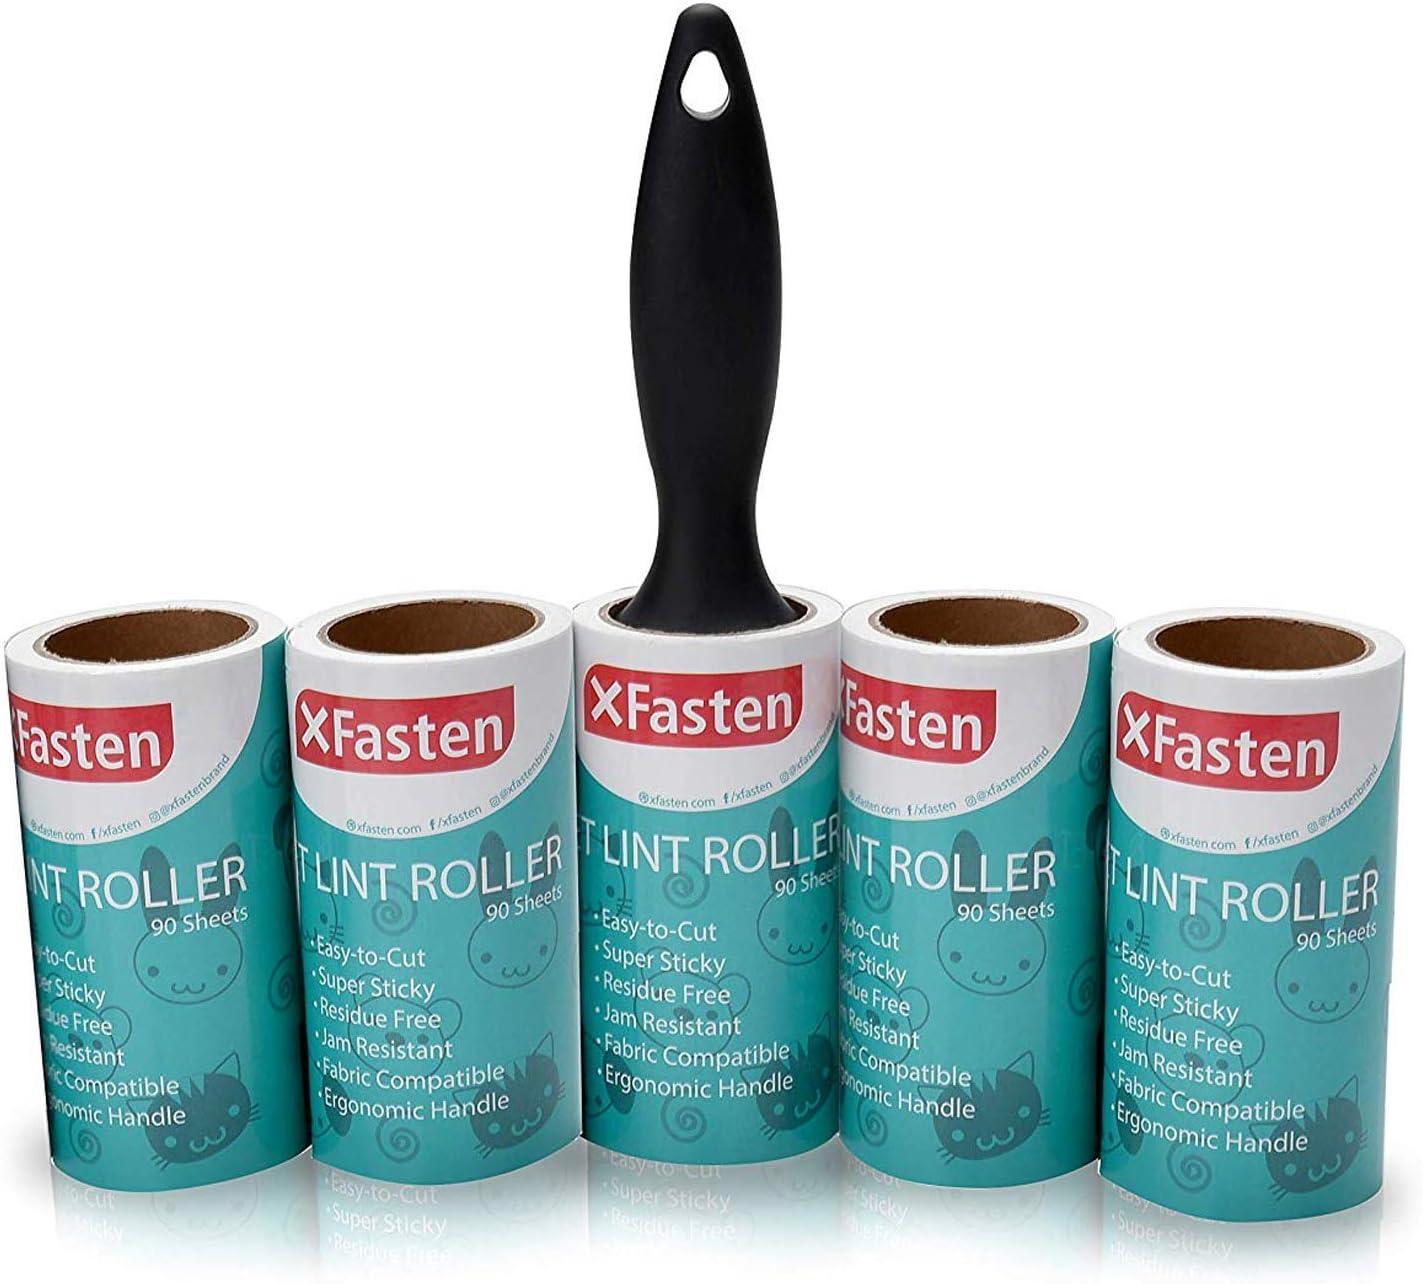 XFasten Pet Lint Roller; 1 Weekly update Roller + Ea Mesa Mall Sheets Refill 90 Rolls 5